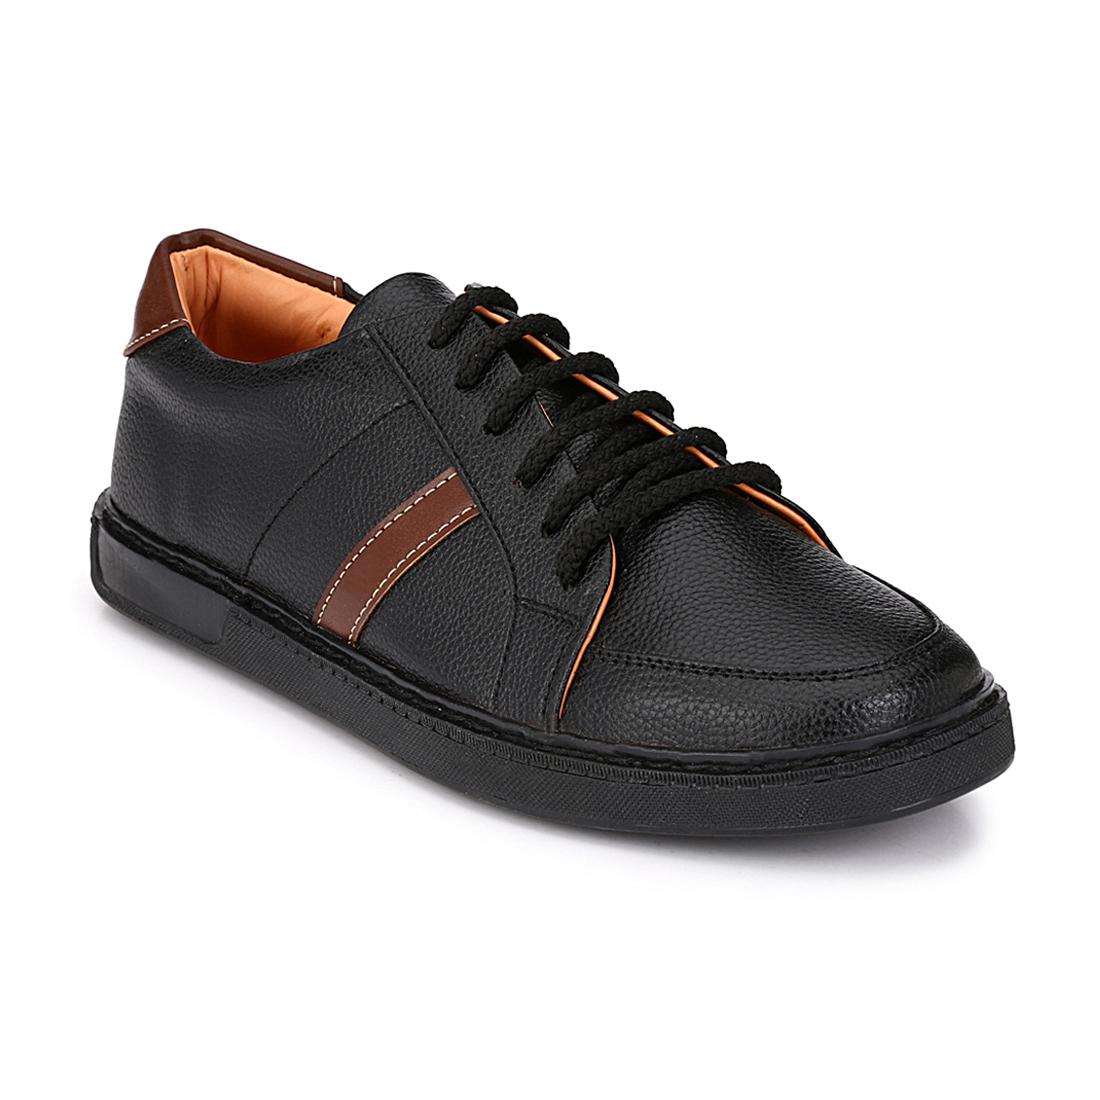 Guava | Guava Men's Draco Sneakers  - Black